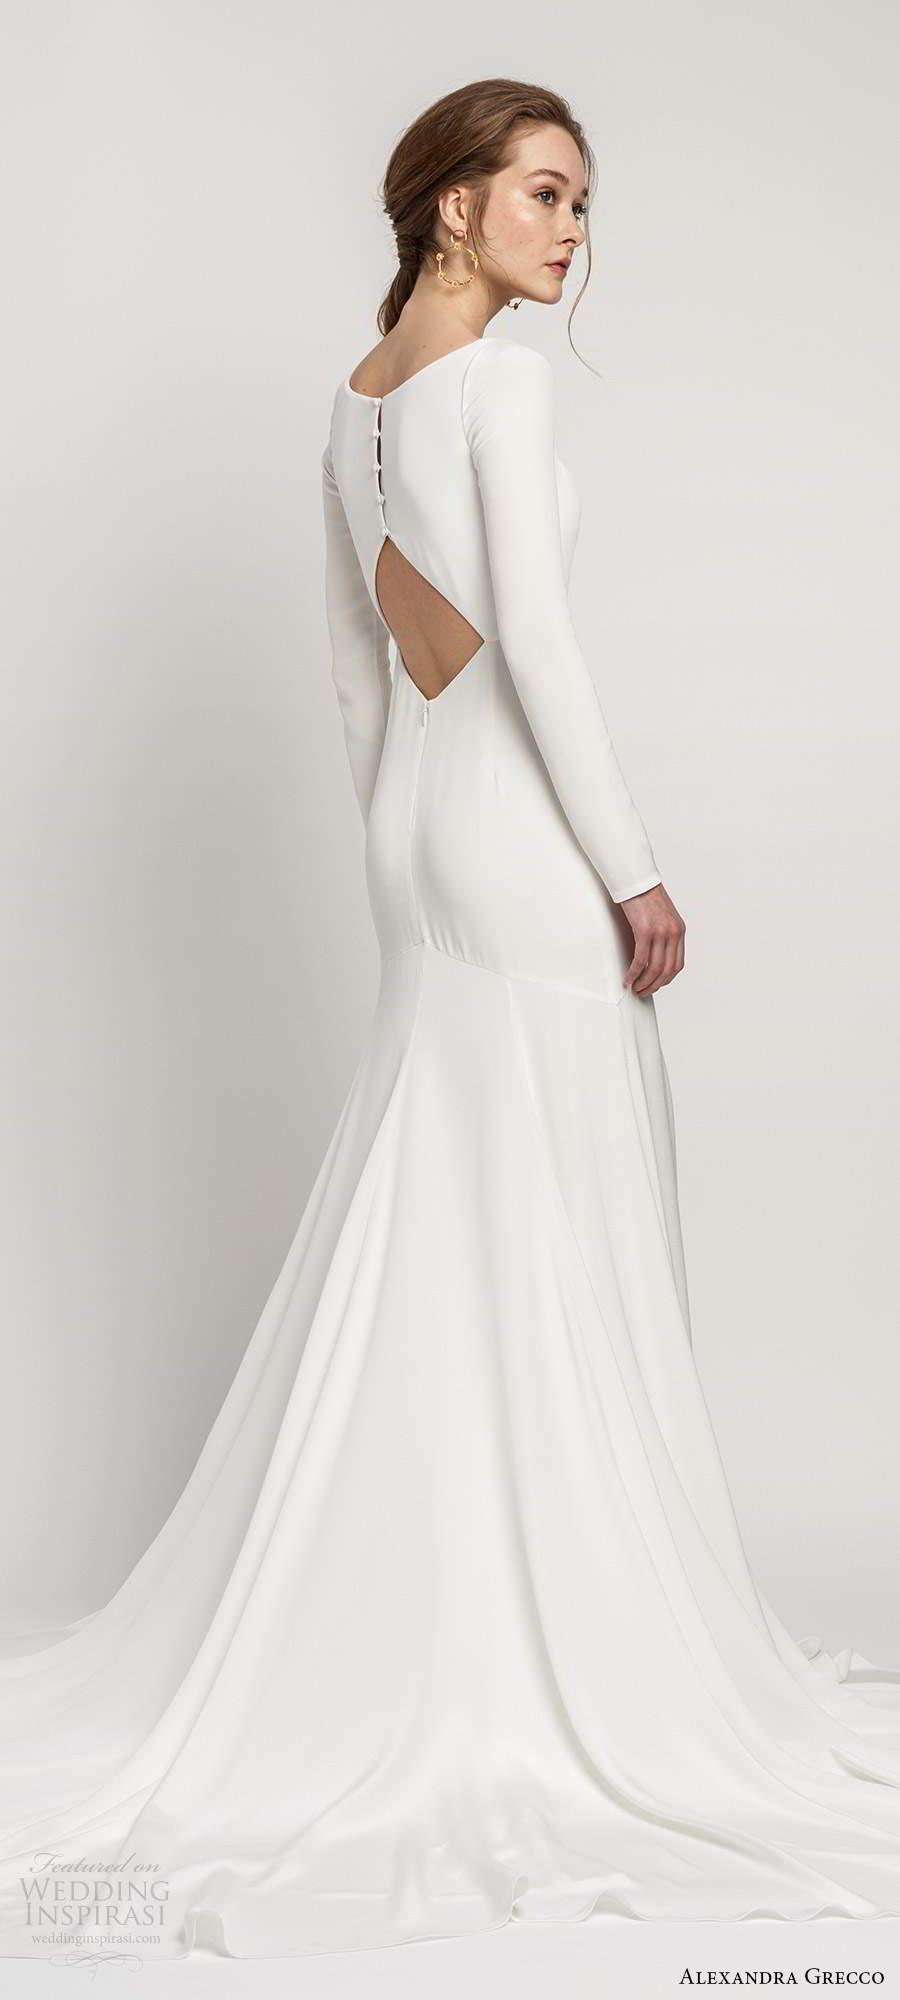 alexandra grecco 2020 bridal long sleeves square neckline minimalist clean fit flare mermaid wedding dress keyhole back chapel train (1) bv